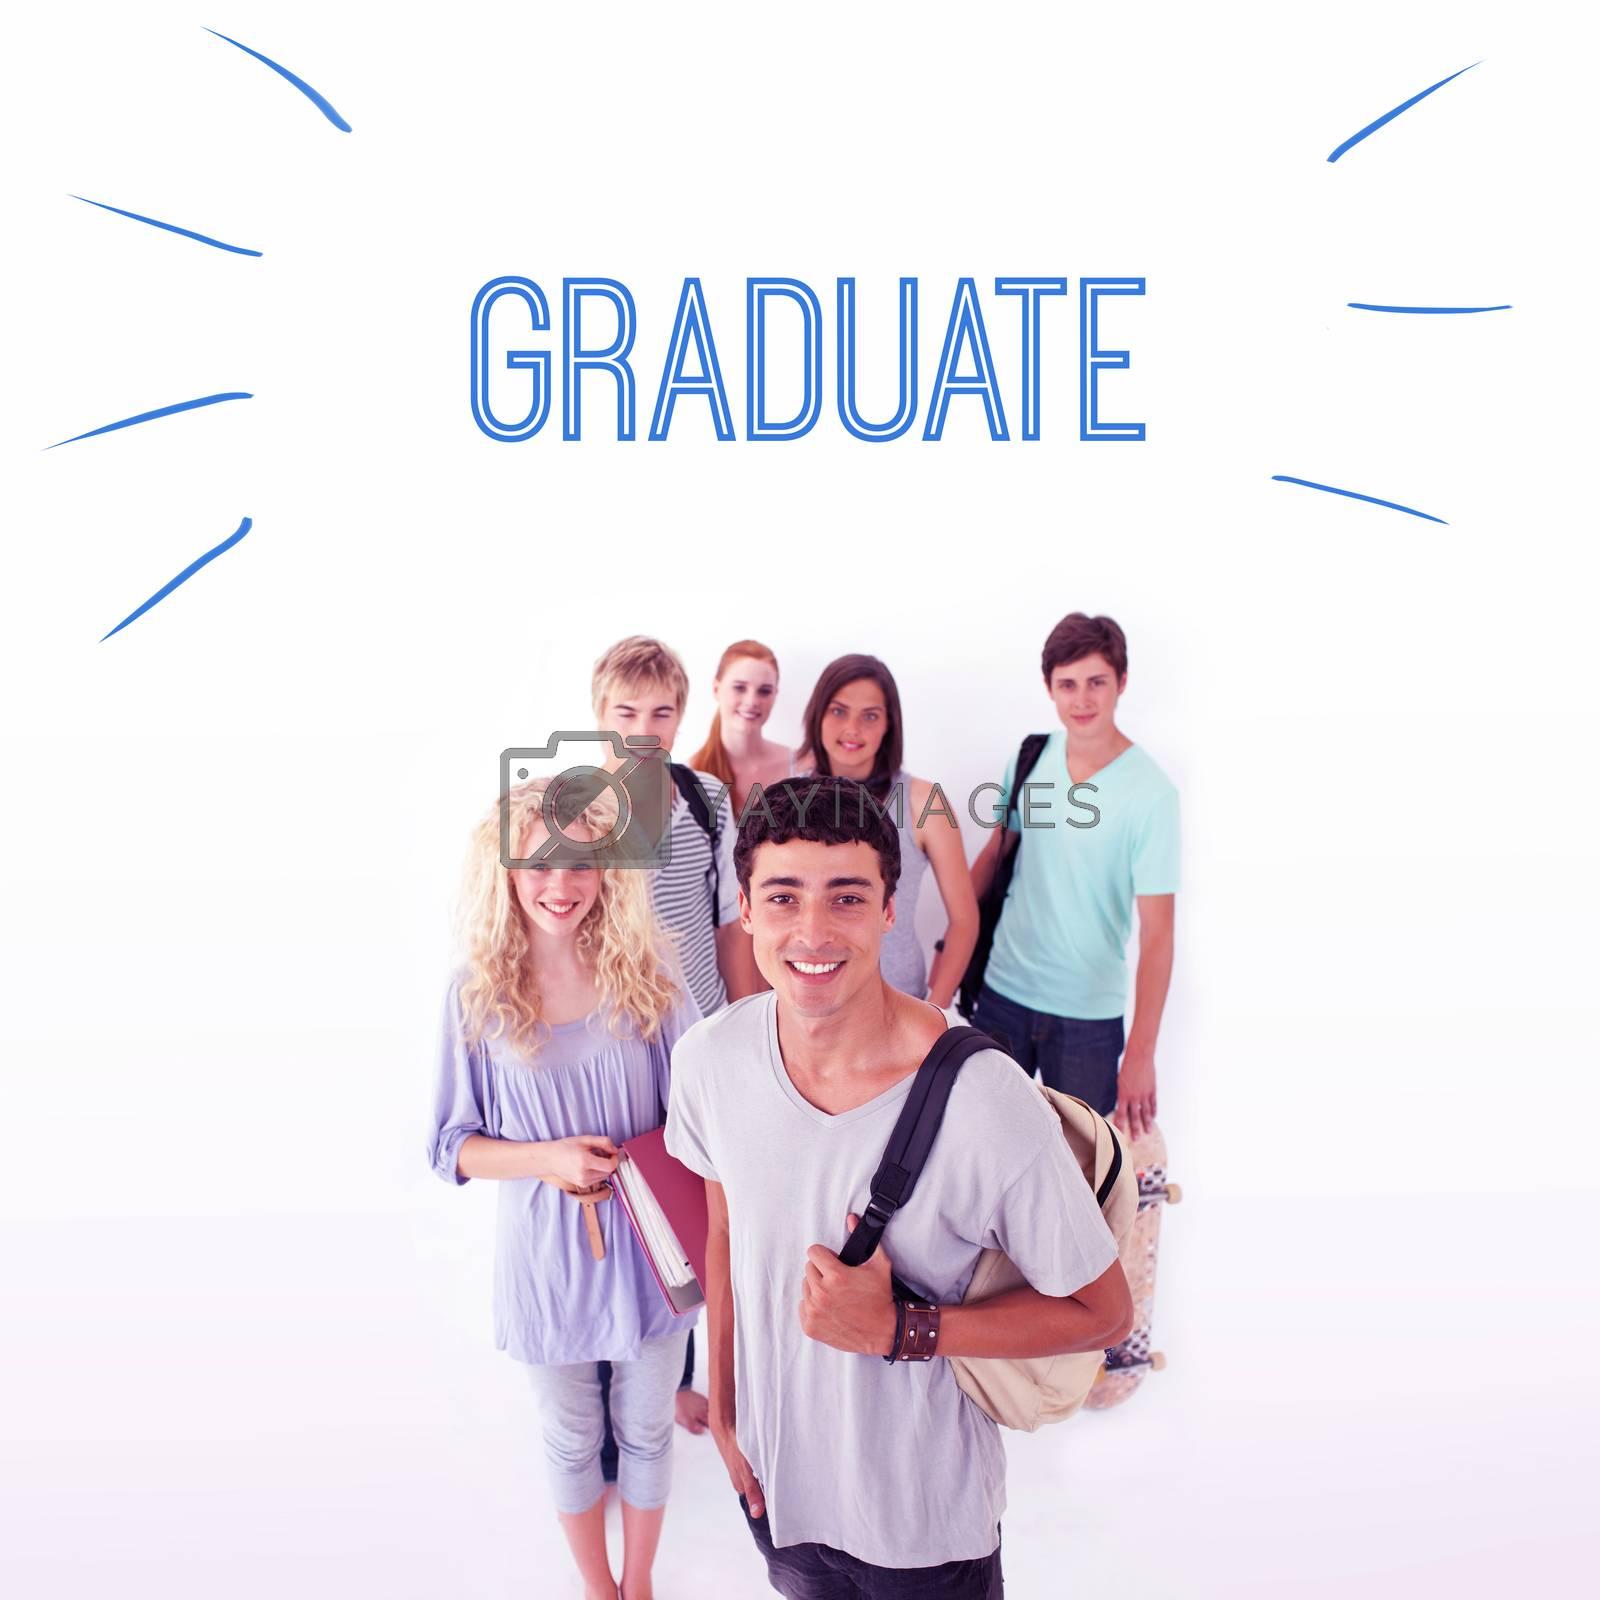 Graduate against smiling students by Wavebreakmedia